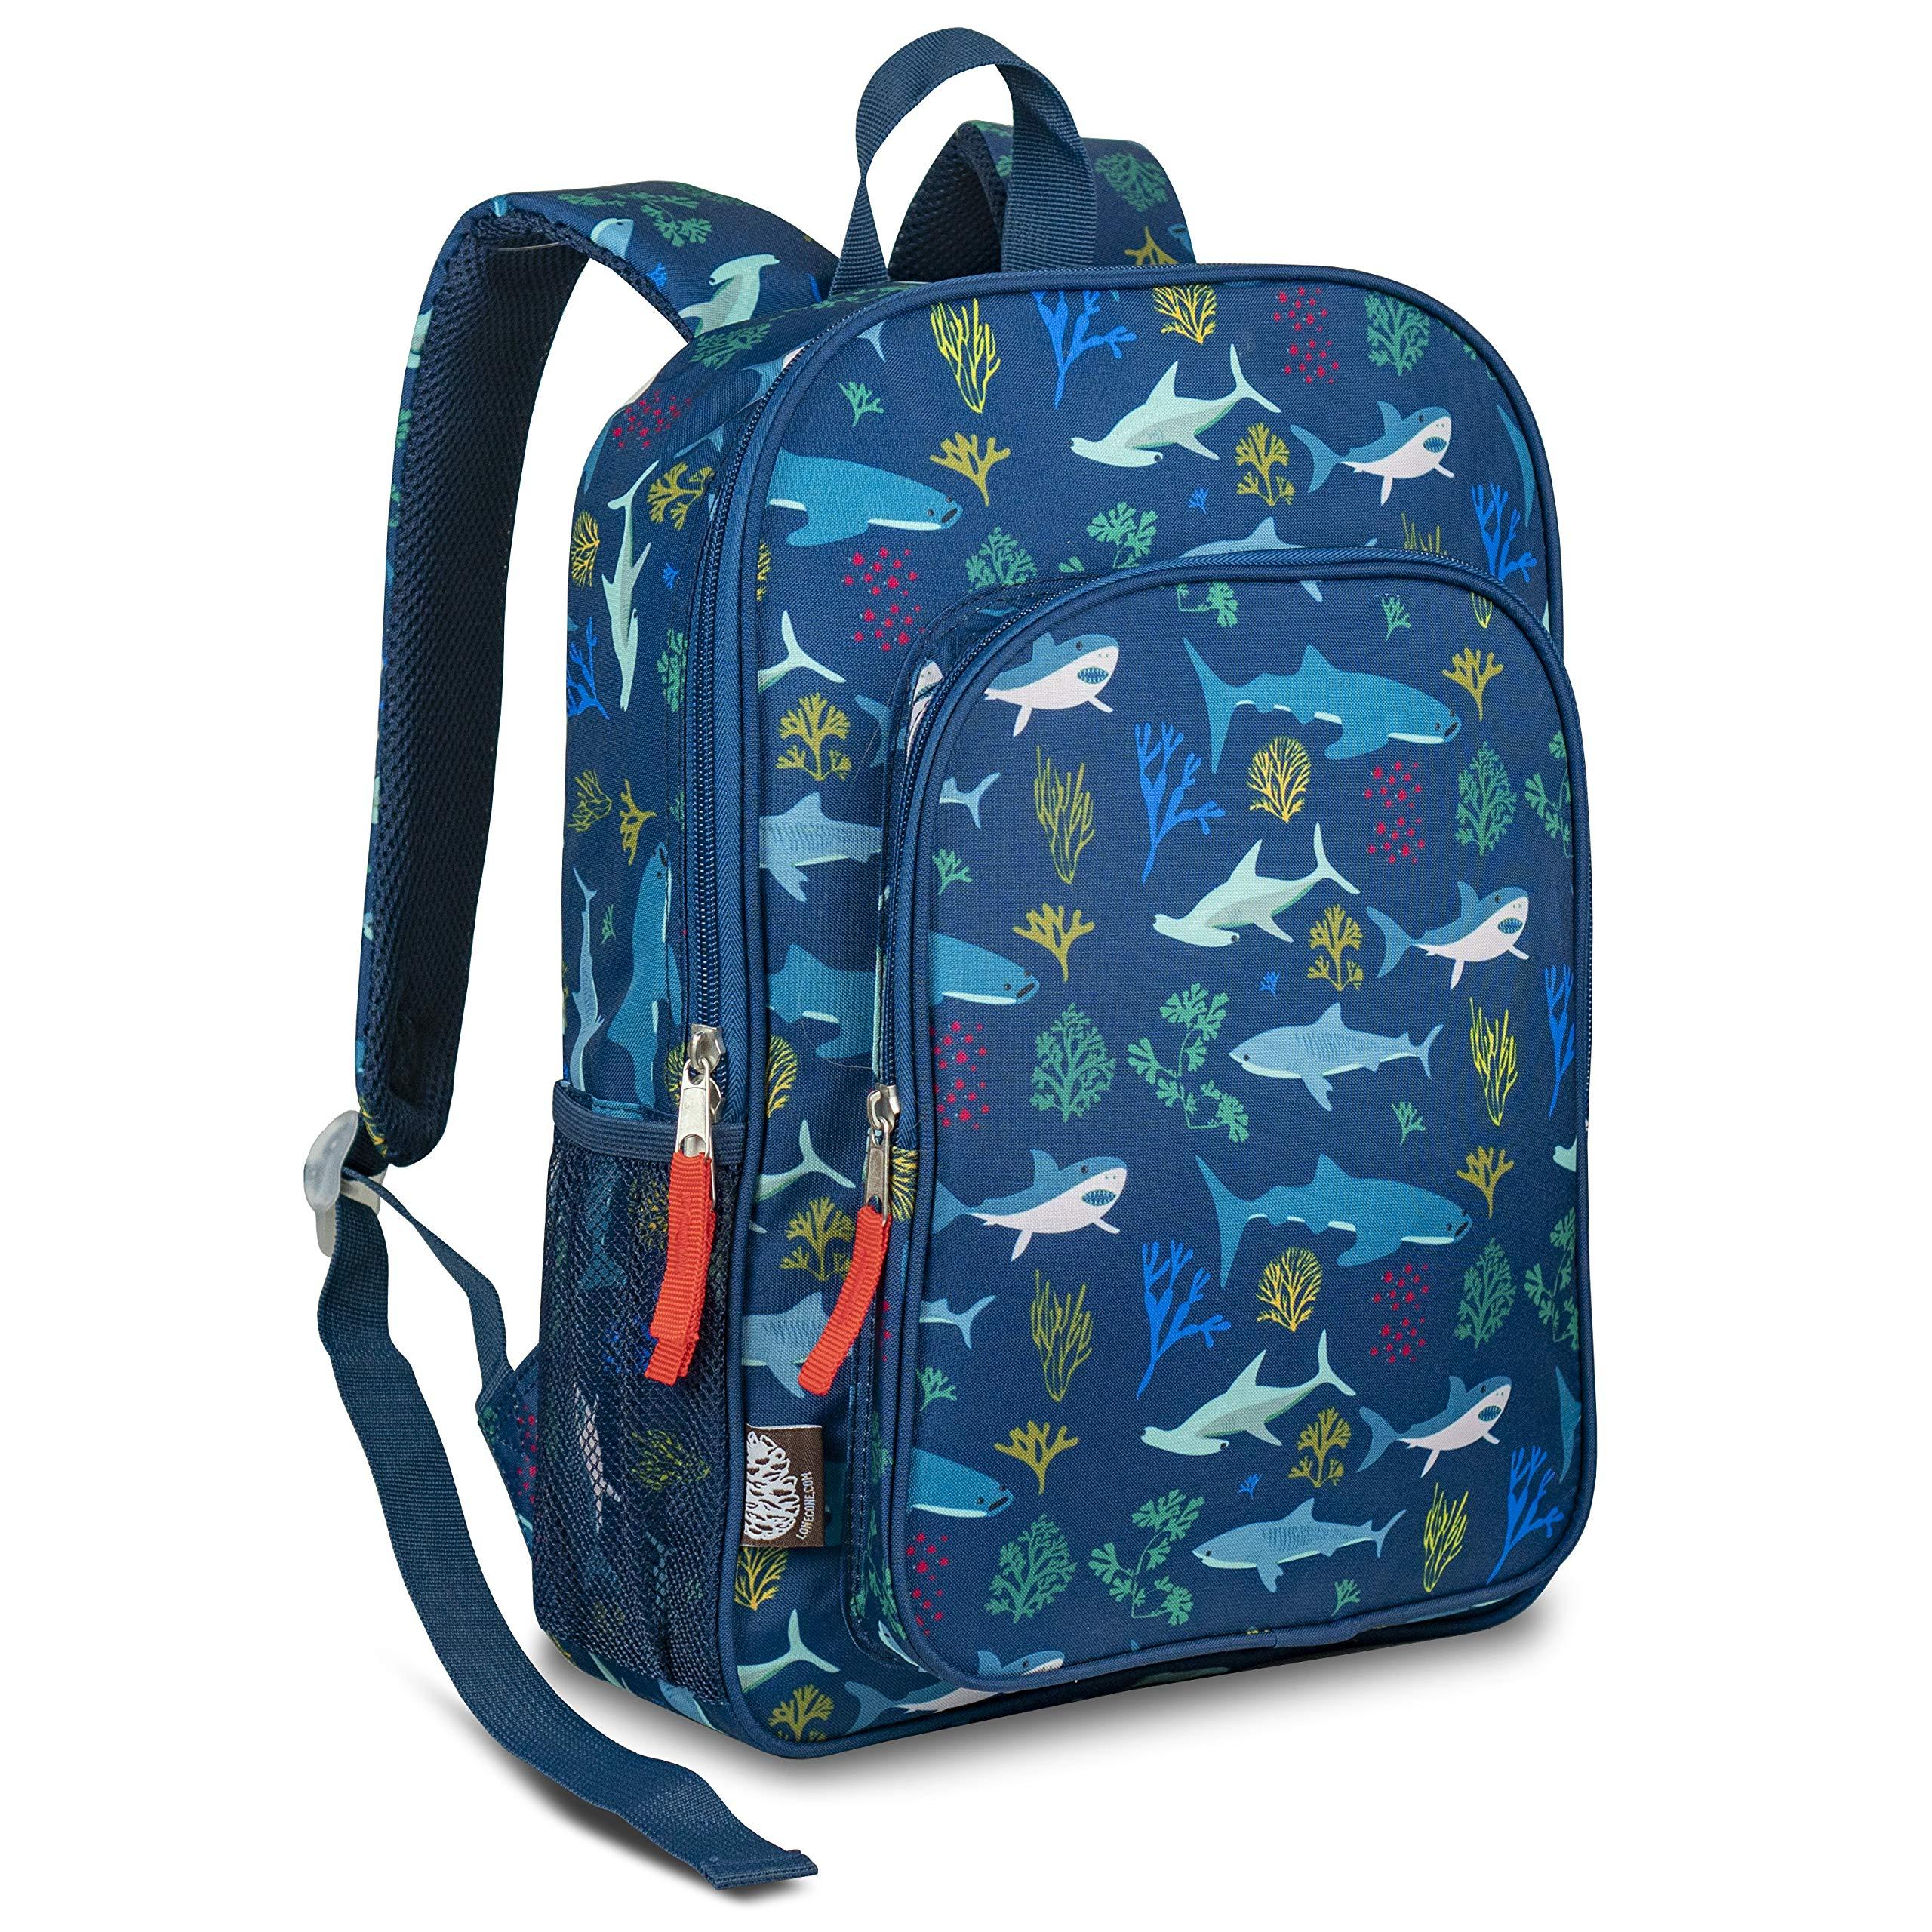 LONECONE Kids School Backpack for Boys and Girls - Sized for Kindergarten, Preschool - Shark School